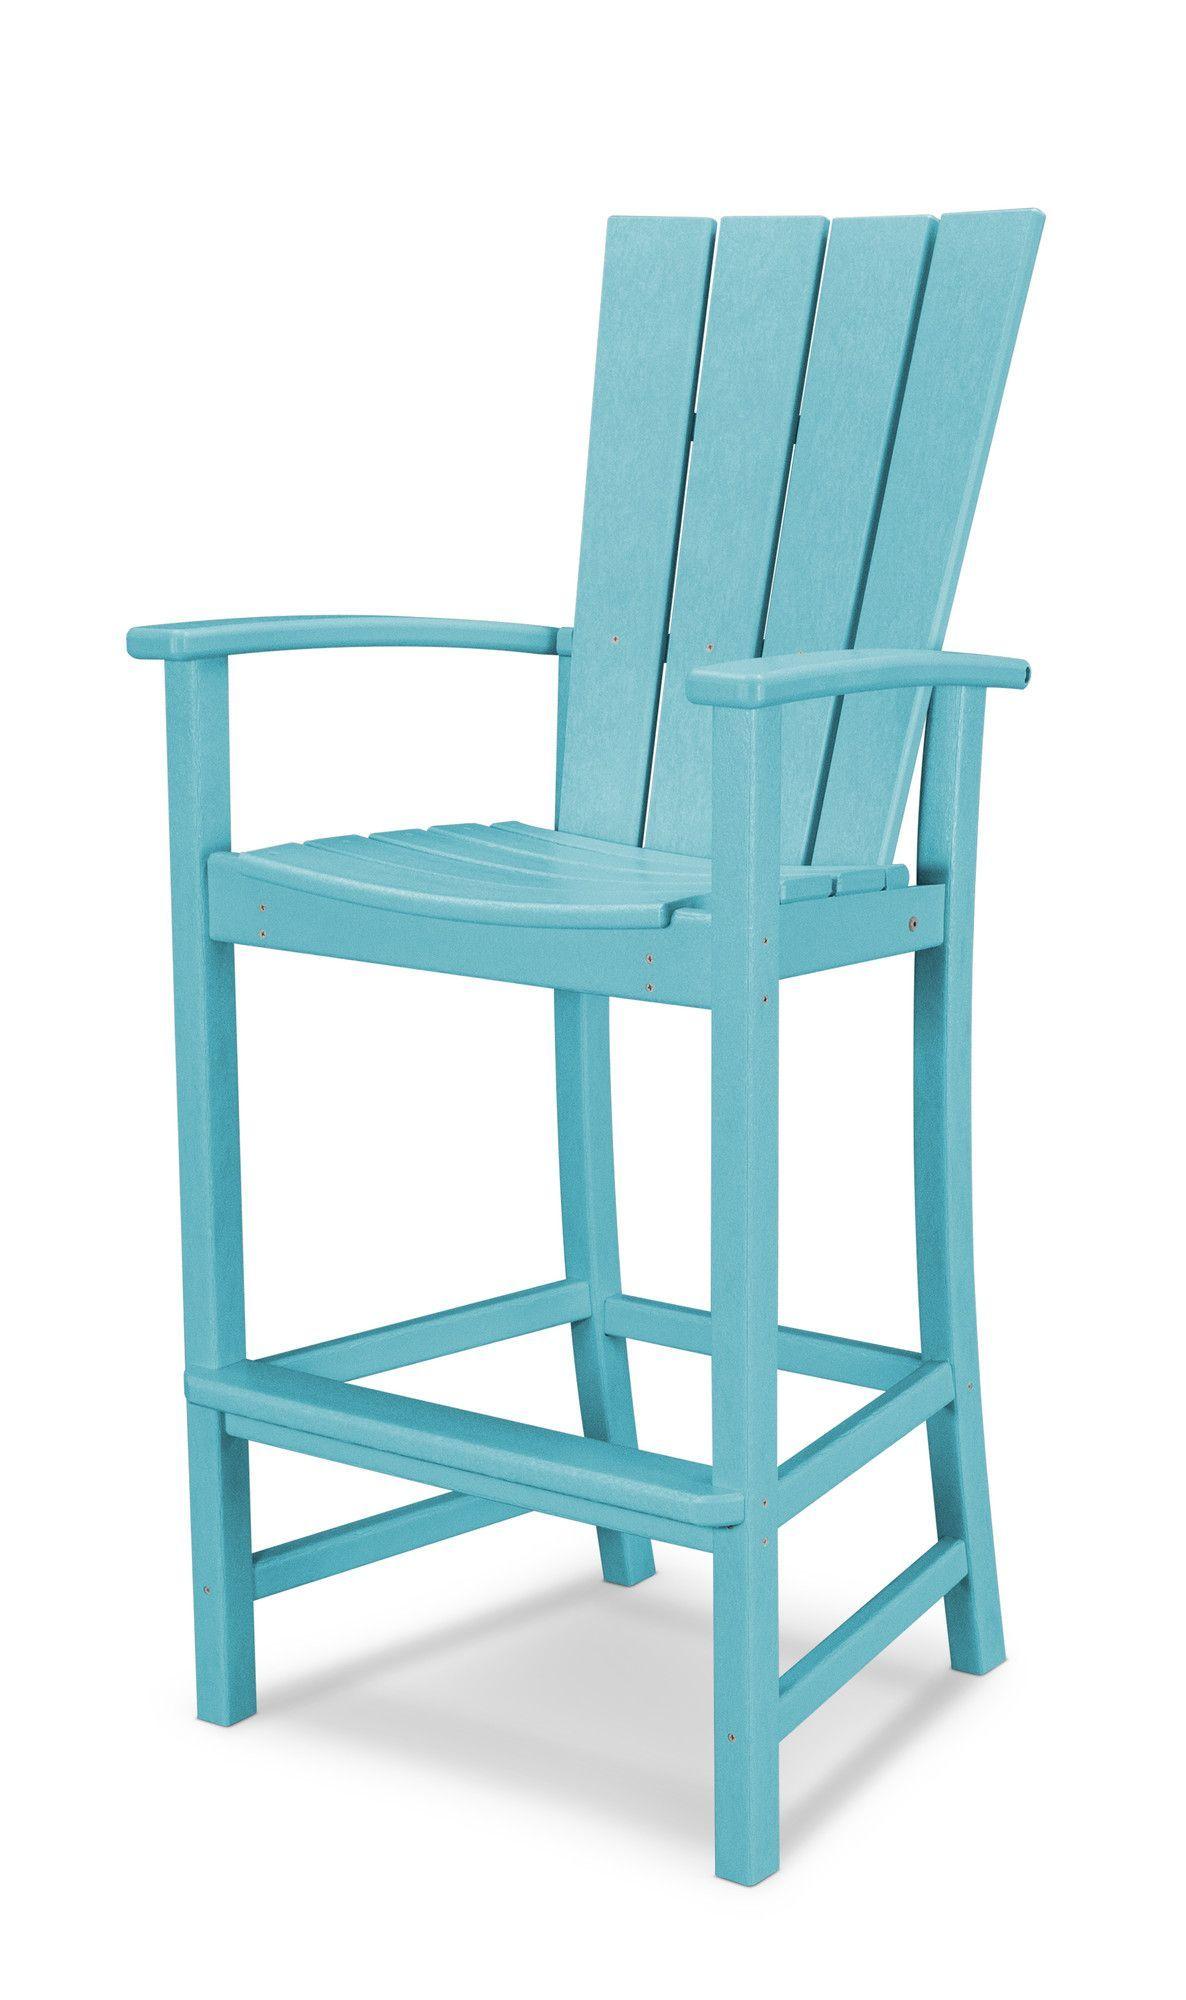 Quattro Plastic Adirondack Chair | Bar chairs, Plastic ...